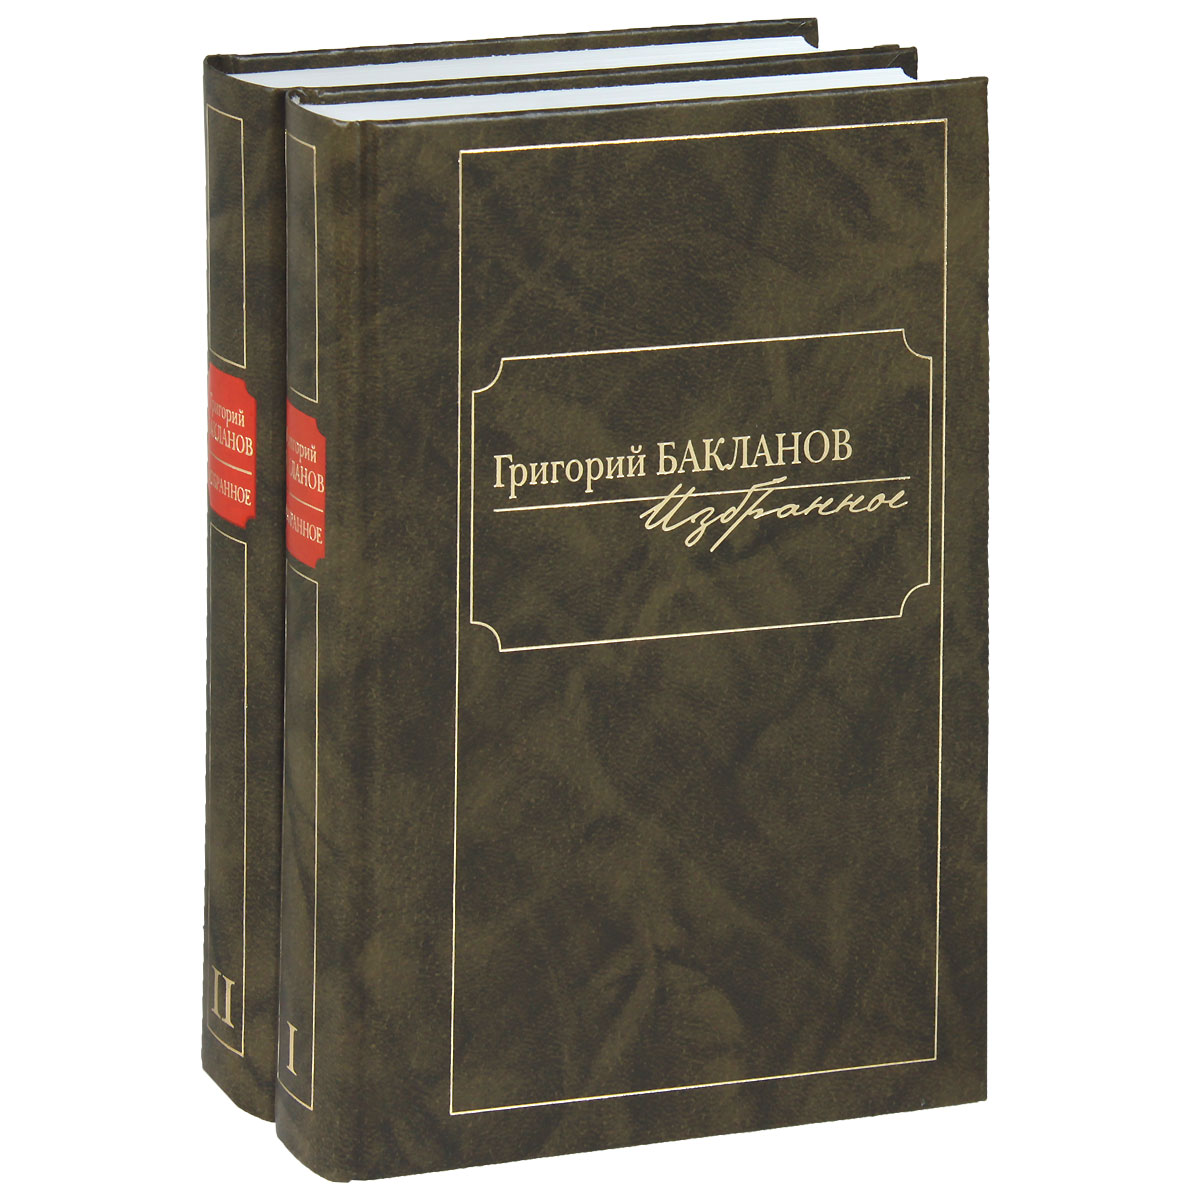 Григорий Бакланов Григорий Бакланов. Избранное (комплект из 2 книг)